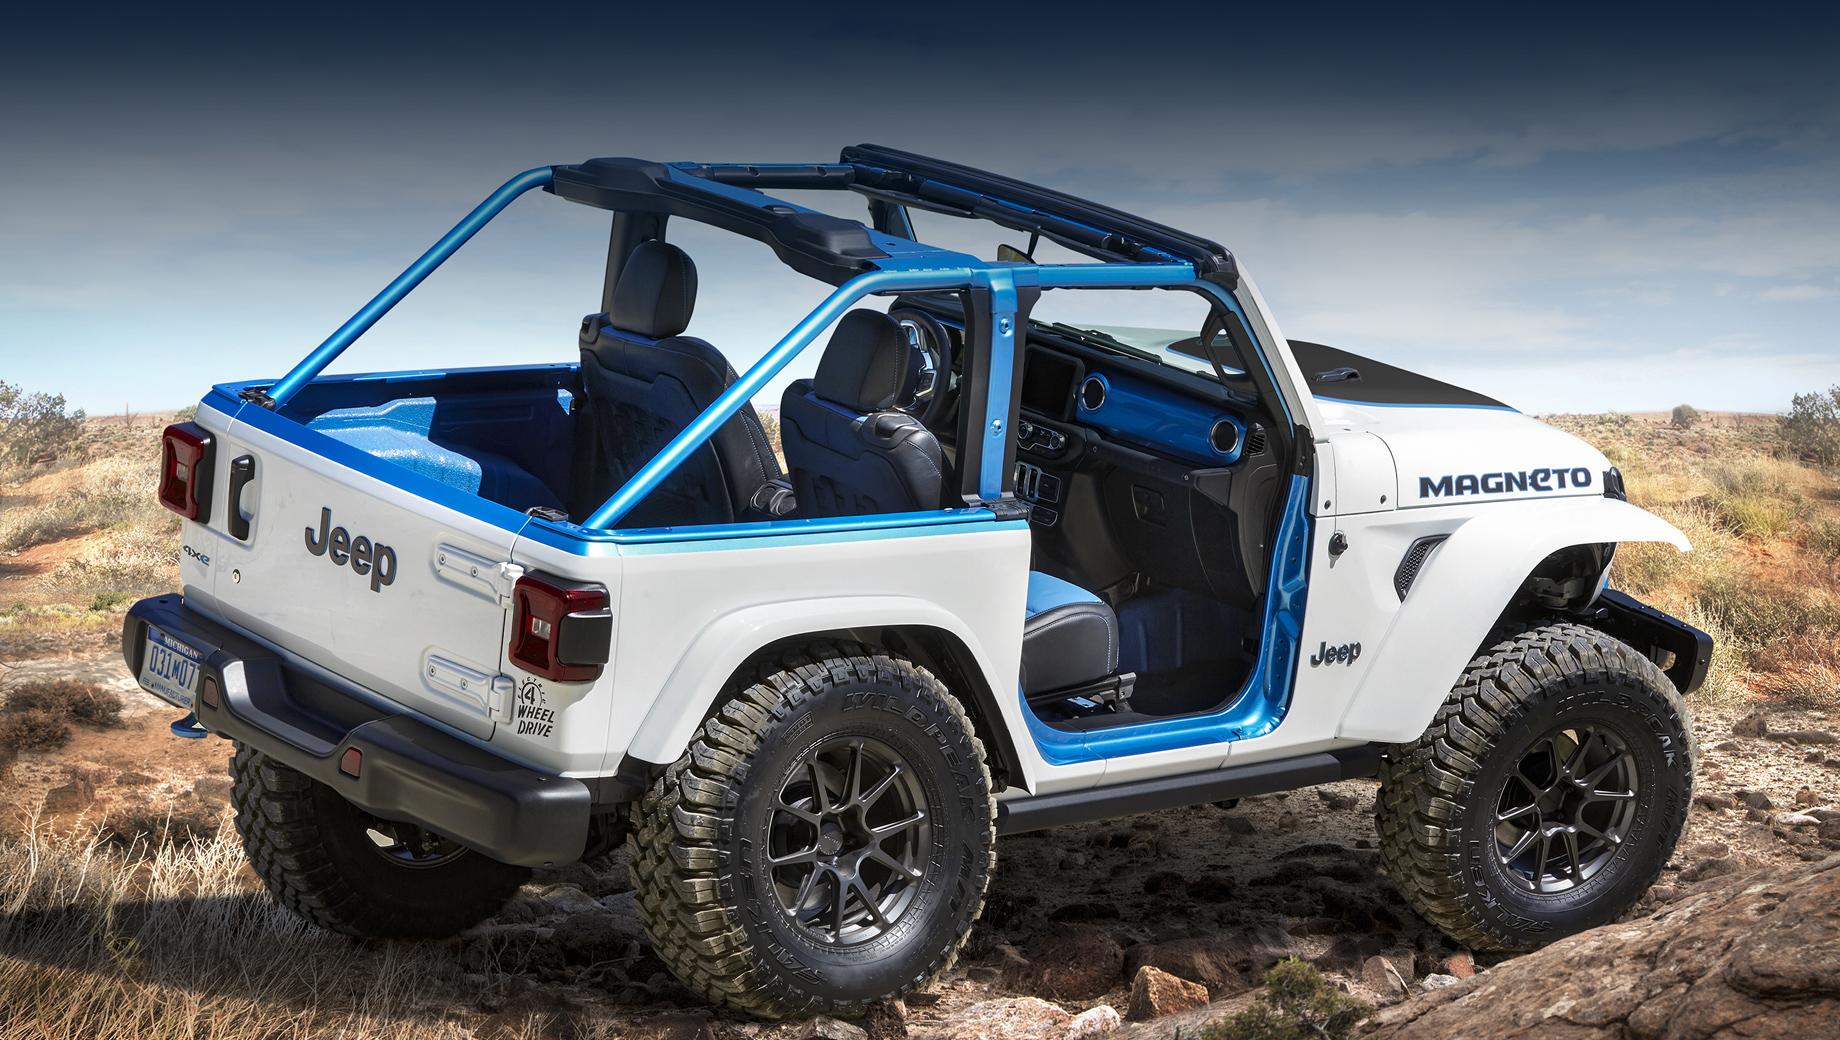 Шоу-кар Jeep Magneto предвосхитил электрическую вариацию Рэнглера